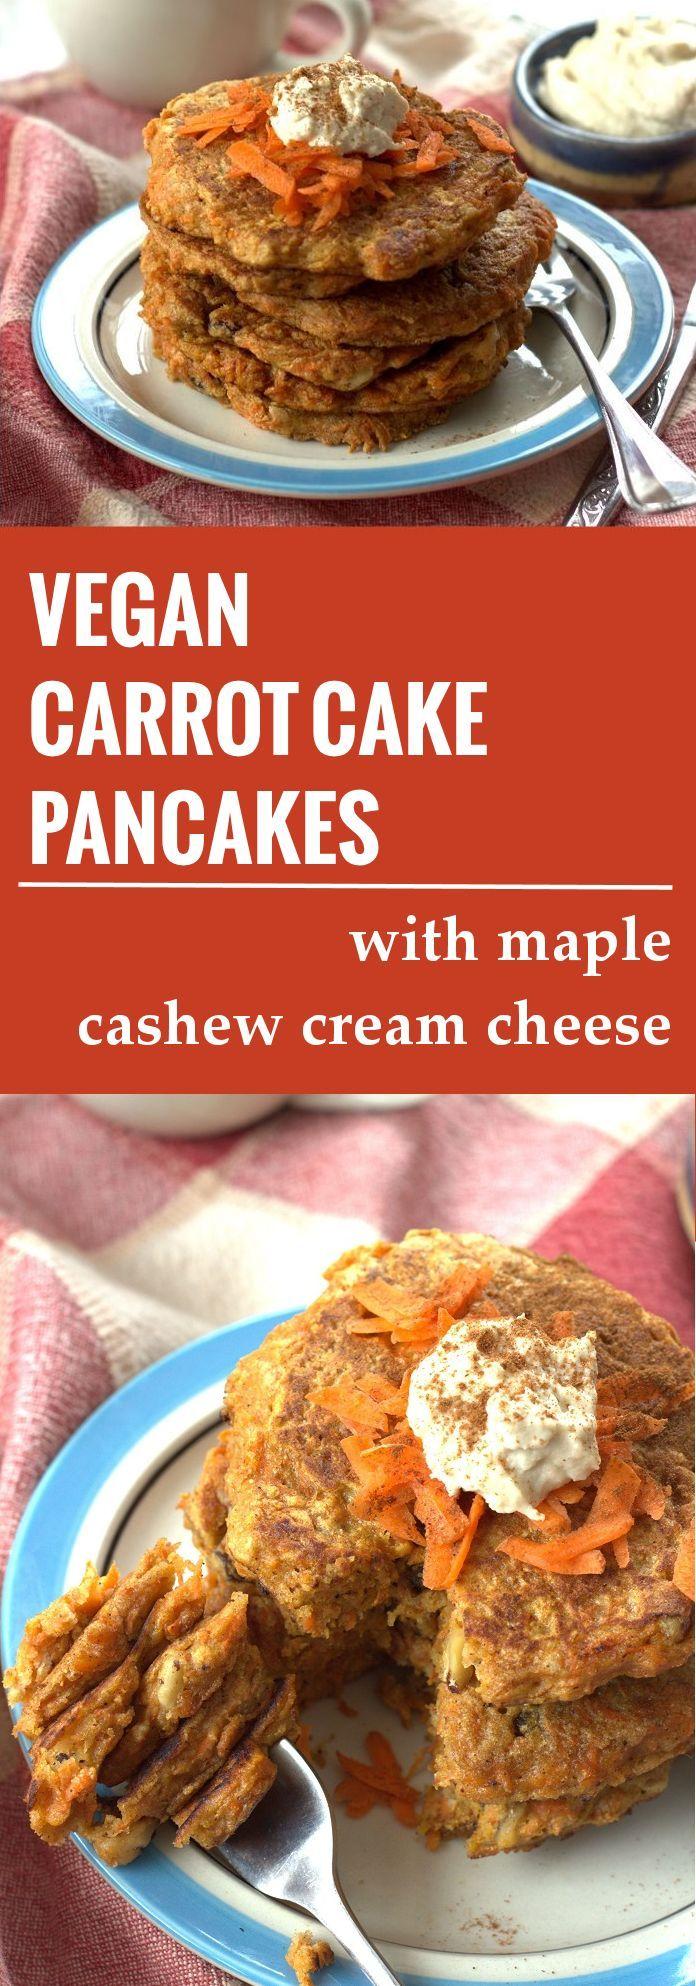 Vegan Carrot Cake Pancakes with Cashew Cream Cheese Maple Topping